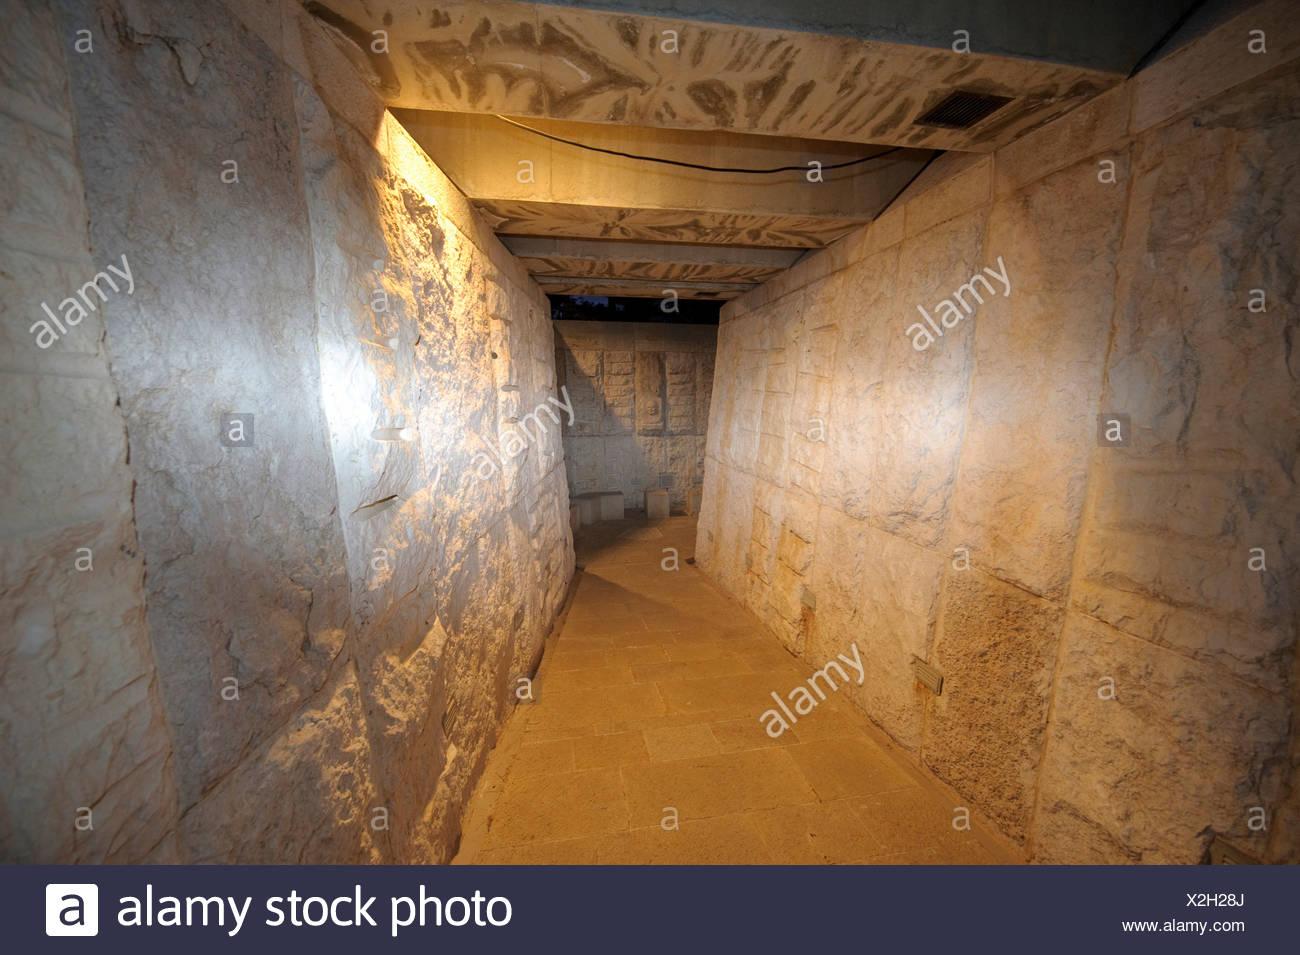 Memorial, Jew, Jewish, pogrom, persecution, Yad Vashem, Holocaust, Israel, Jerusalem, Middle East, Near East, inside - Stock Image